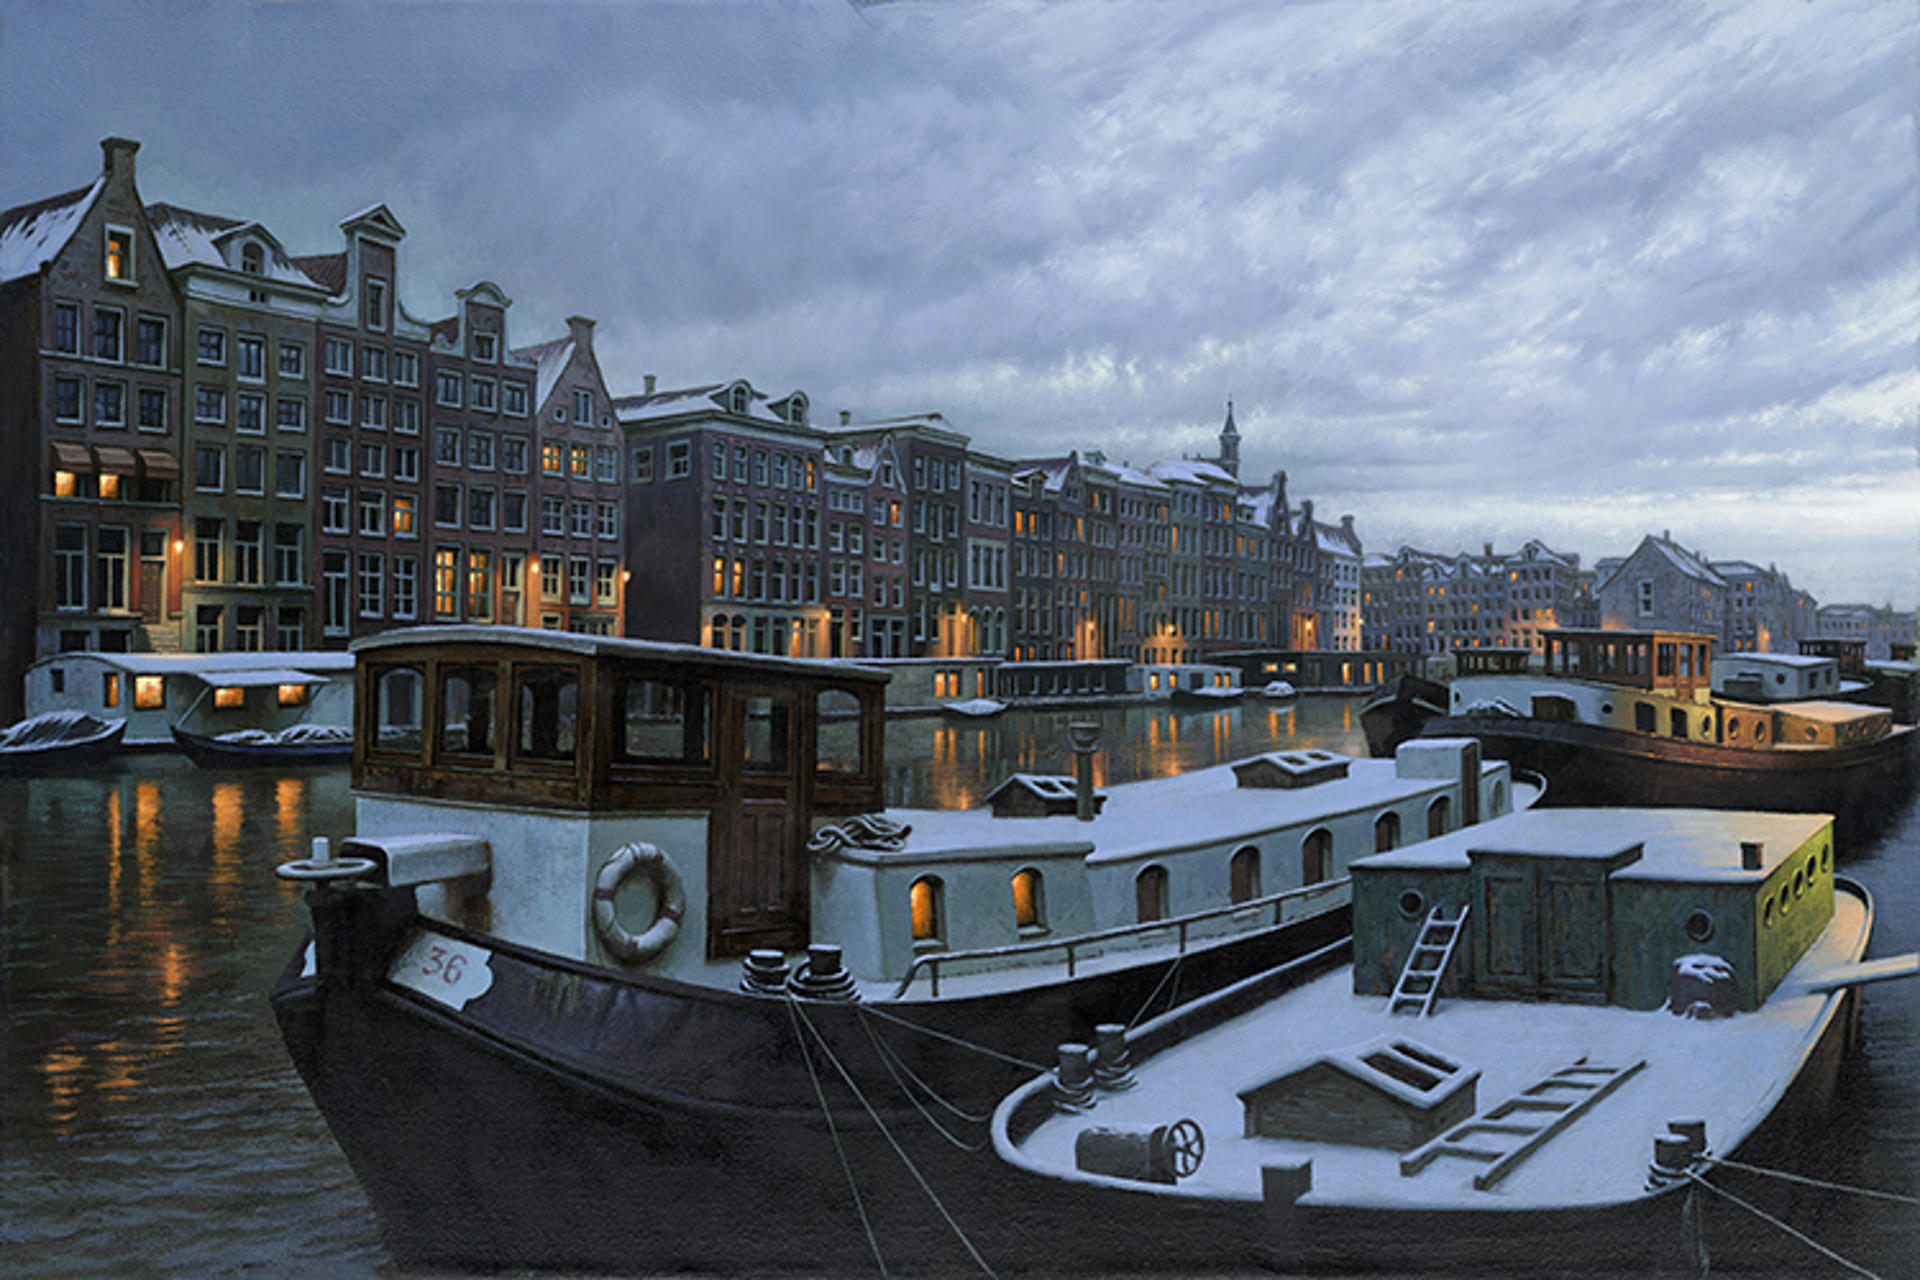 December Skies by Alexei Butirskiy